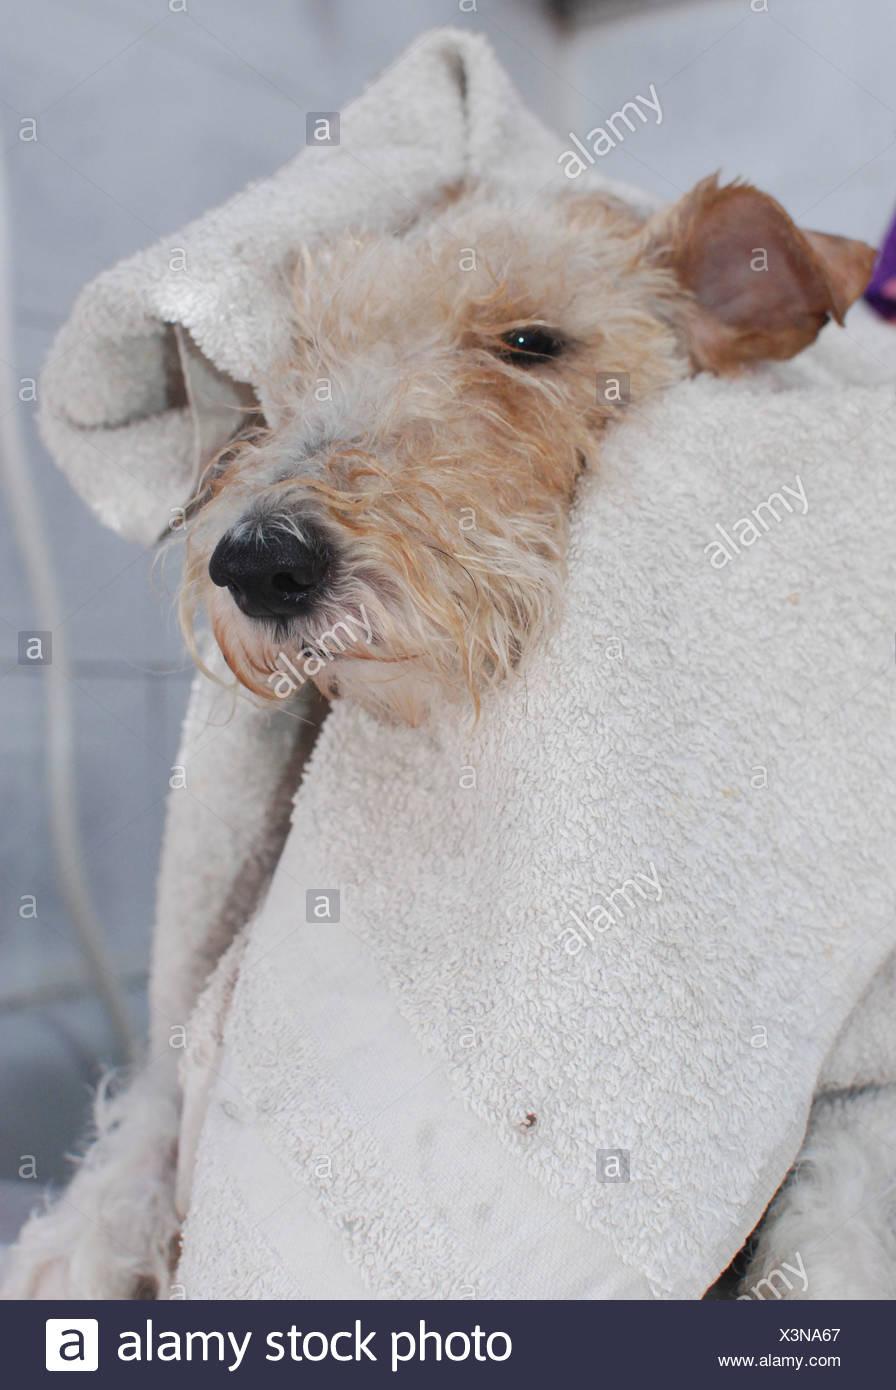 Fox Terrier in the bath Stock Photo: 277678863 - Alamy